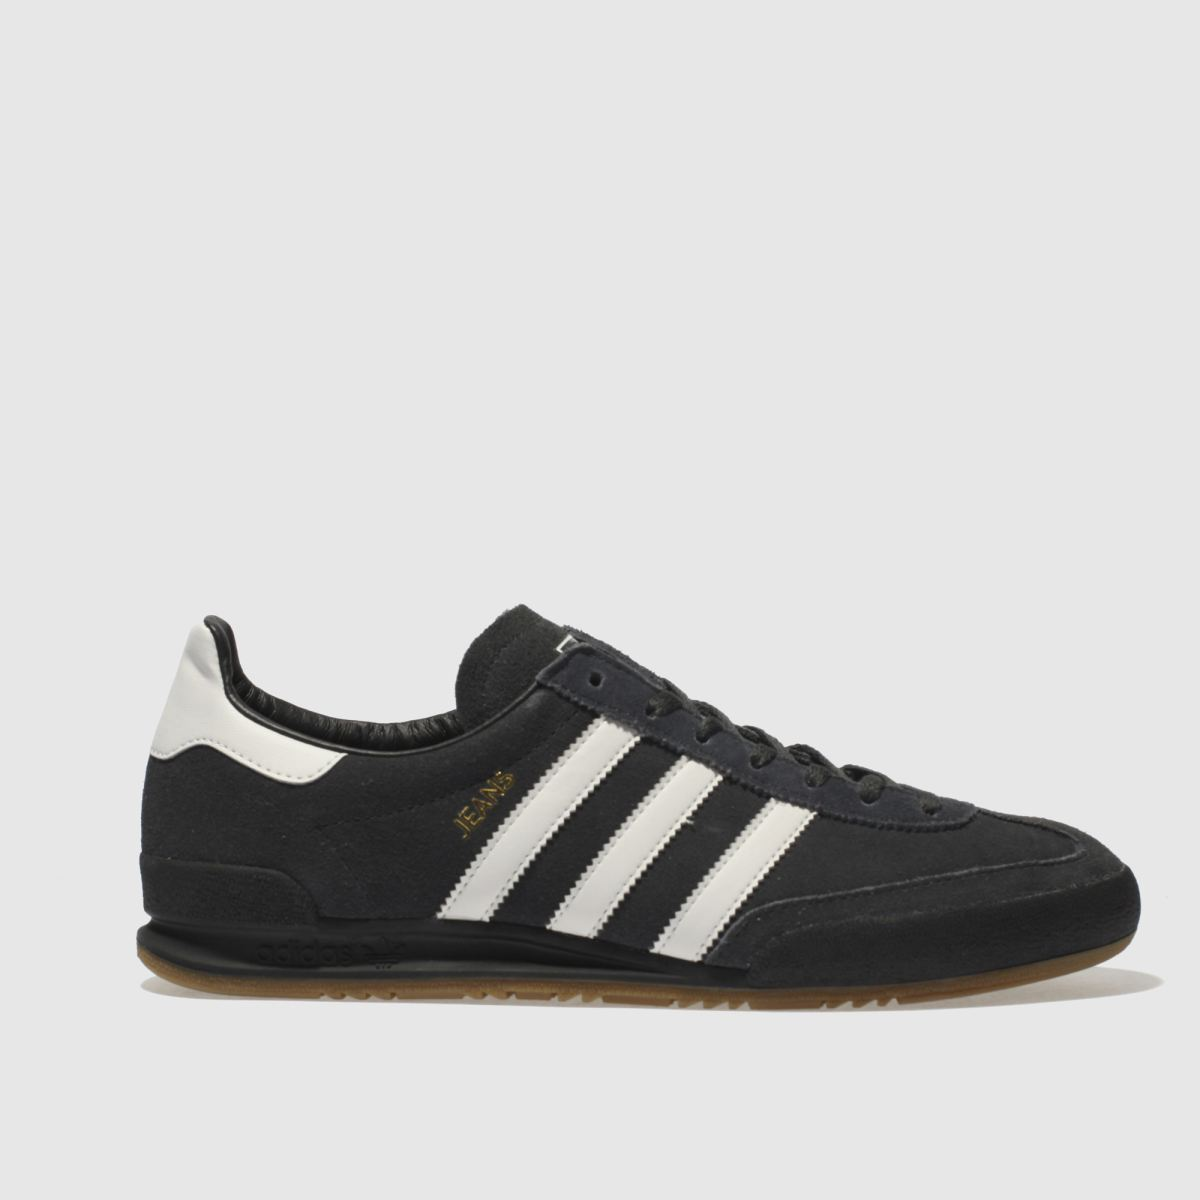 Adidas Dark Grey Jeans Trainers | UK 8 | Male